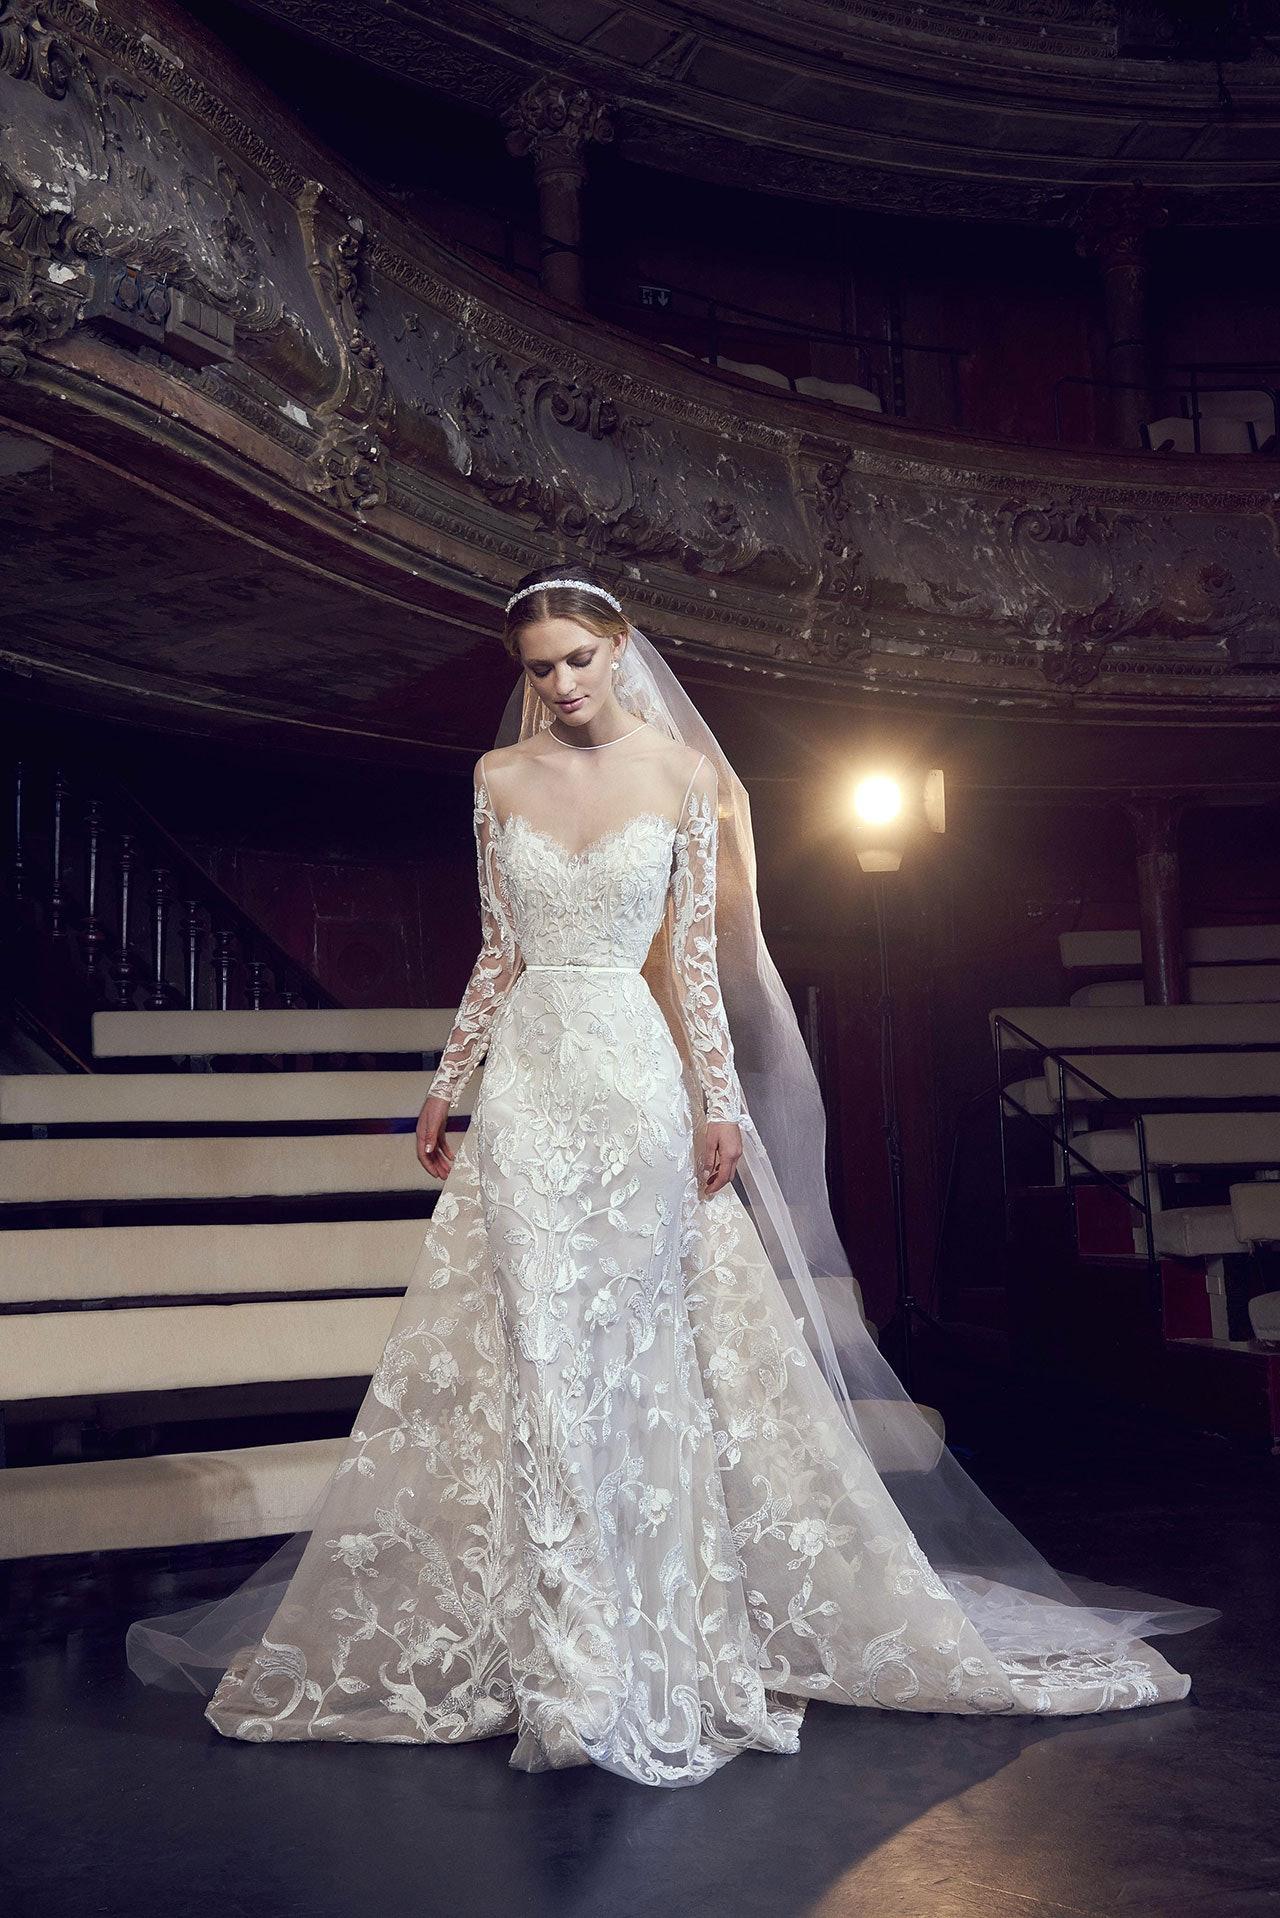 Royal Wedding Dress Meghan Markle.The Royal Wedding Dress Meghan Markle Dacc